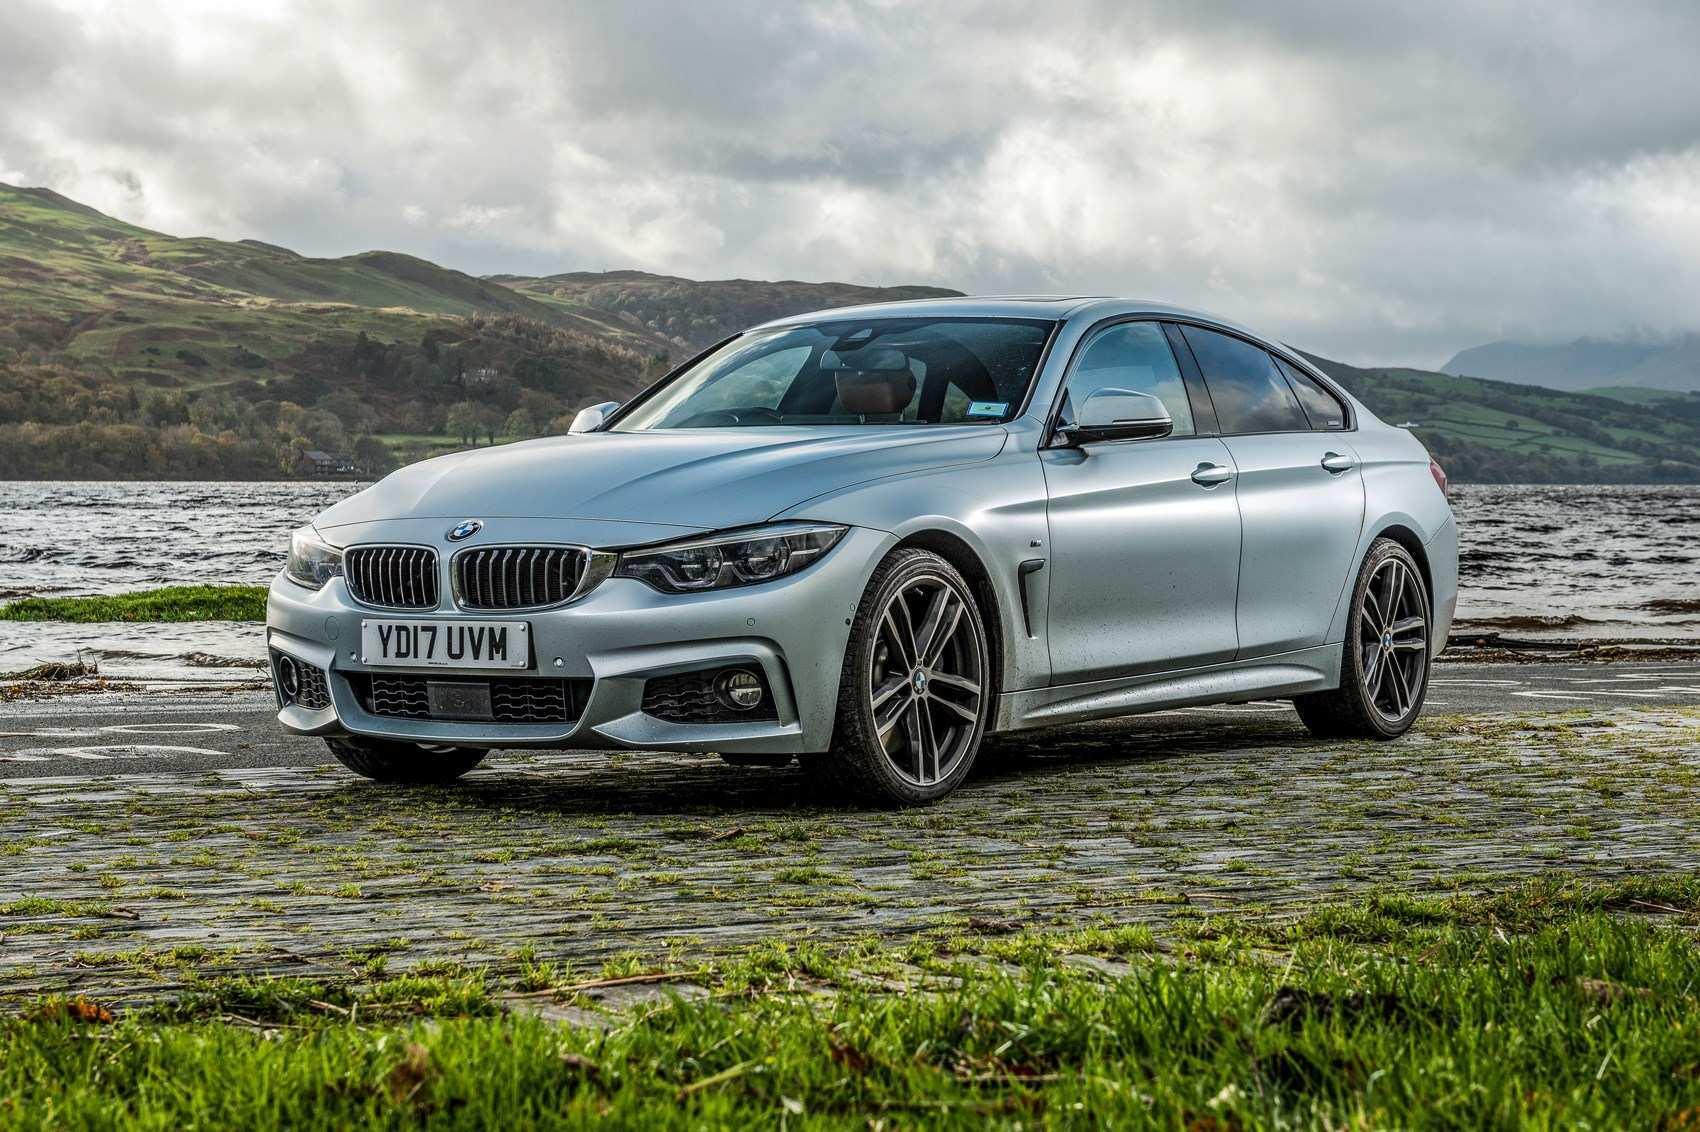 60 New BMW F36 2020 Rumors by BMW F36 2020